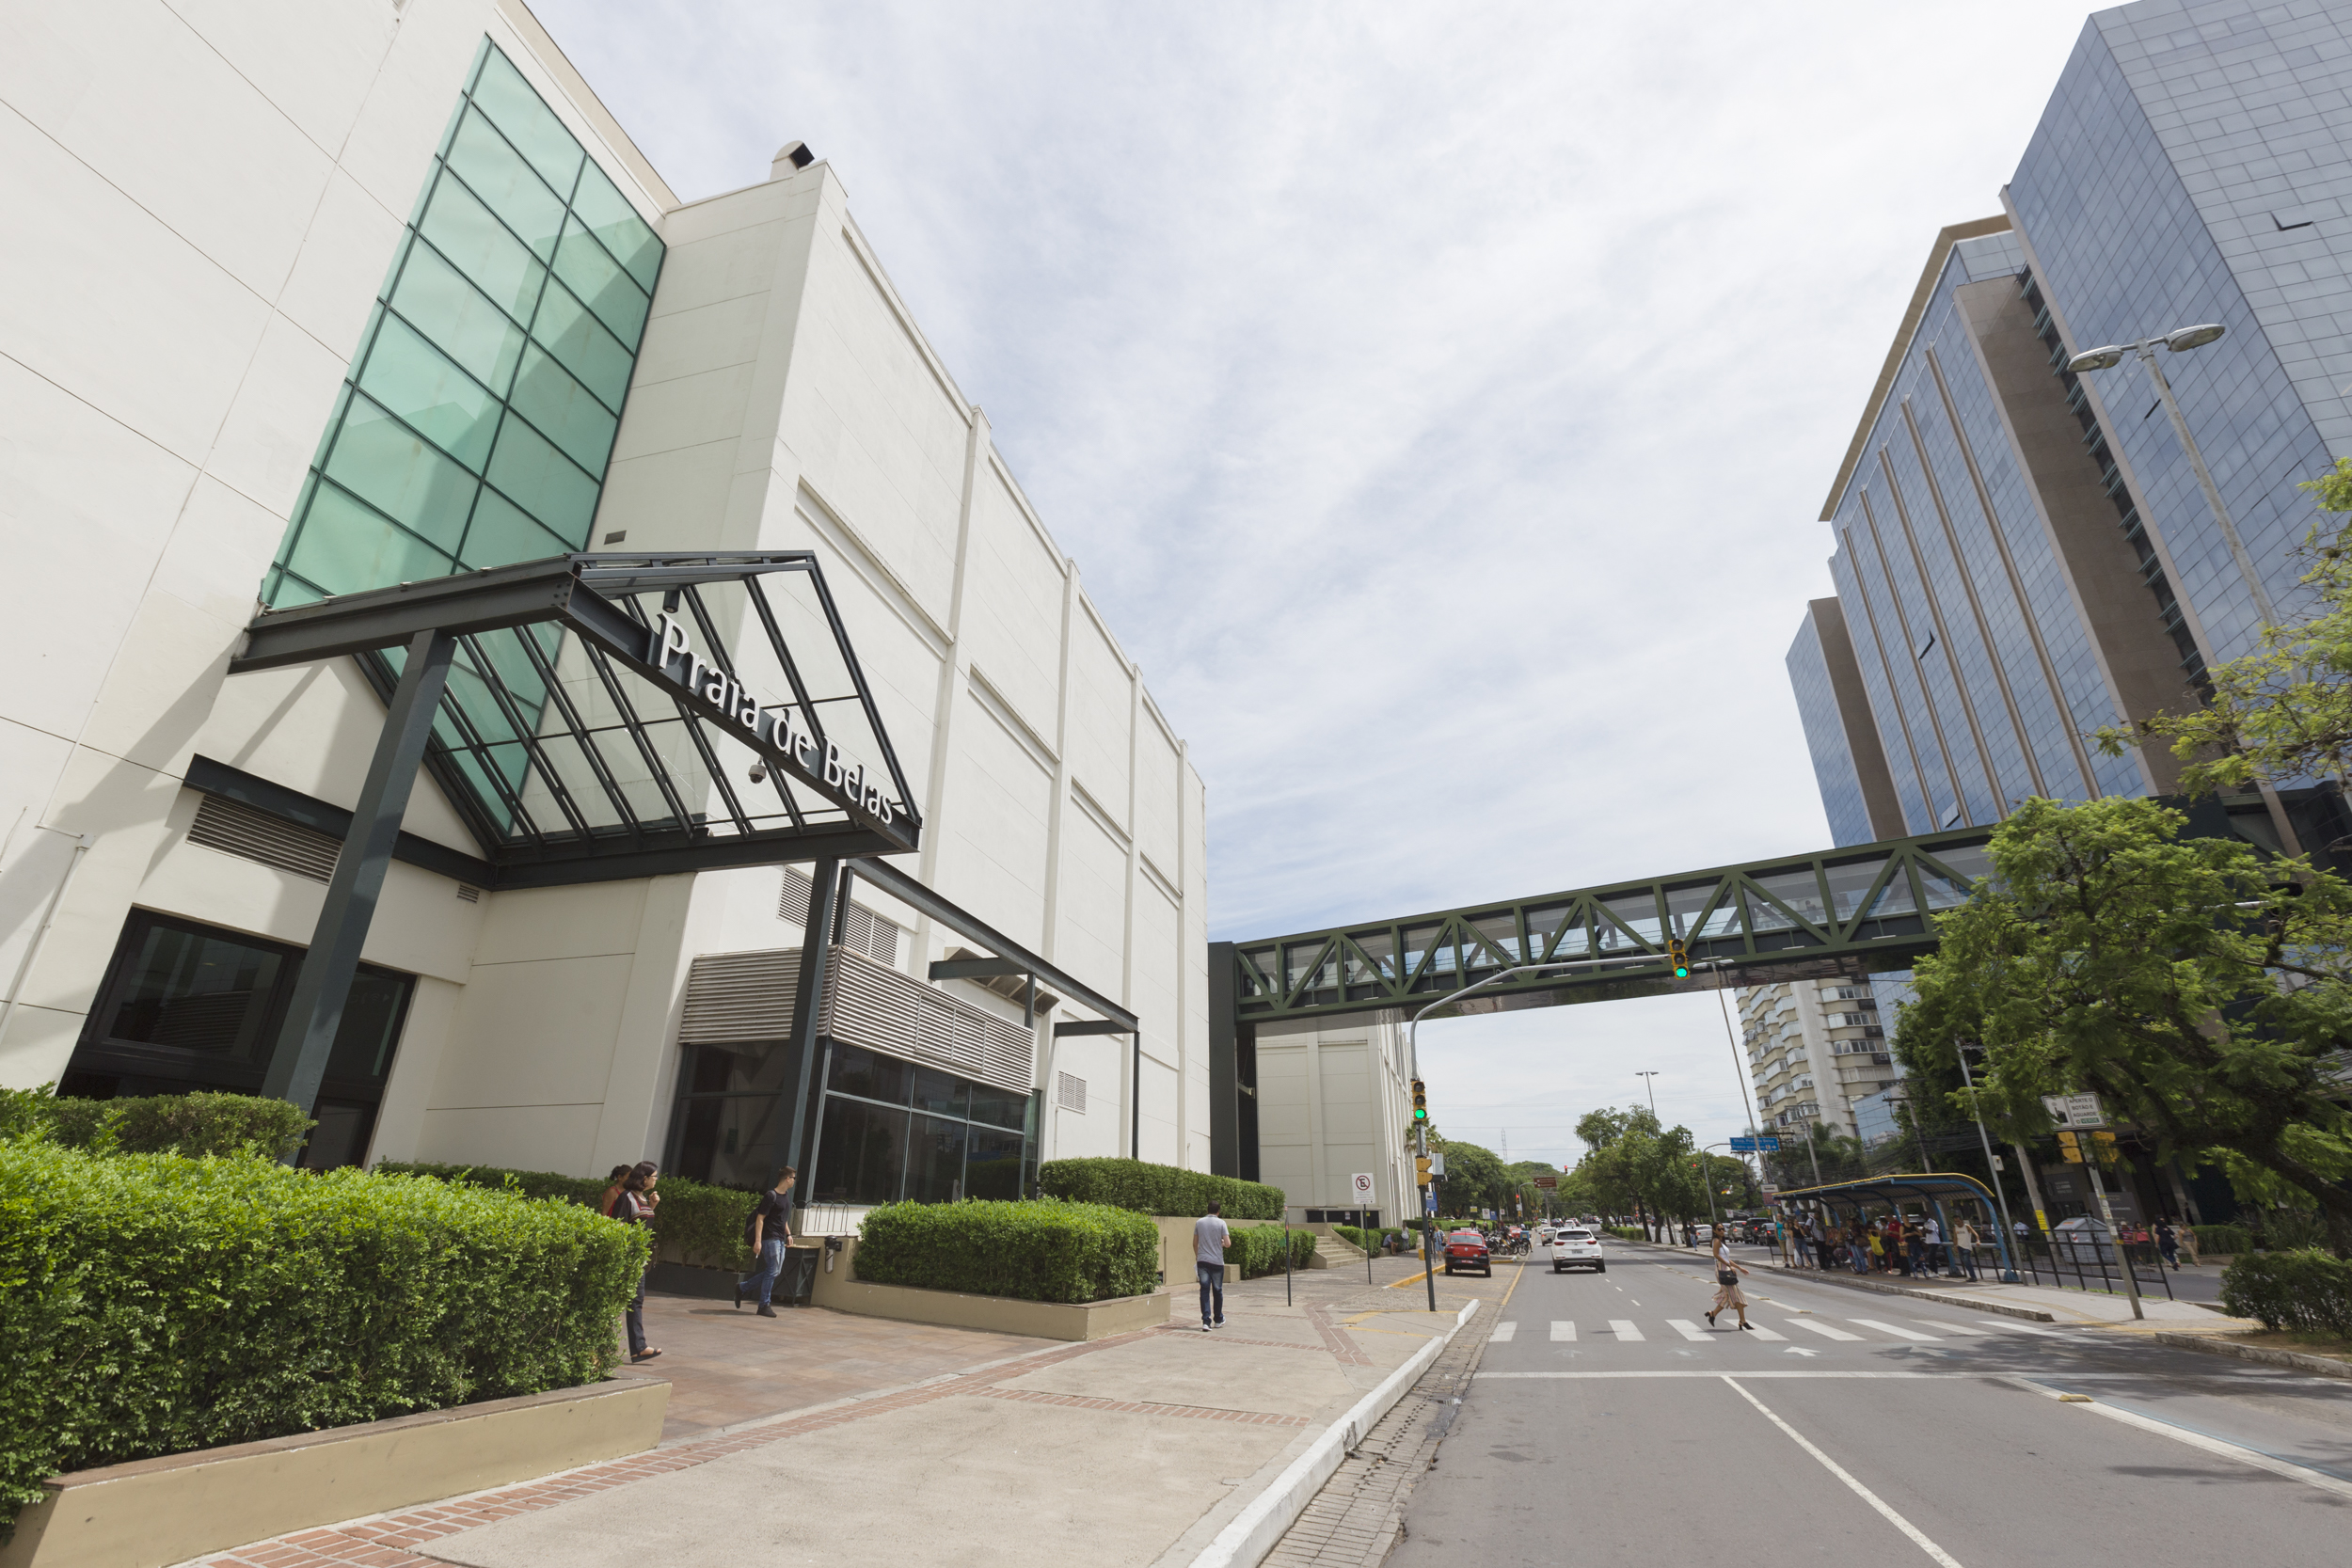 Praia de belas shopping center   divulga%c3%a7%c3%a3o